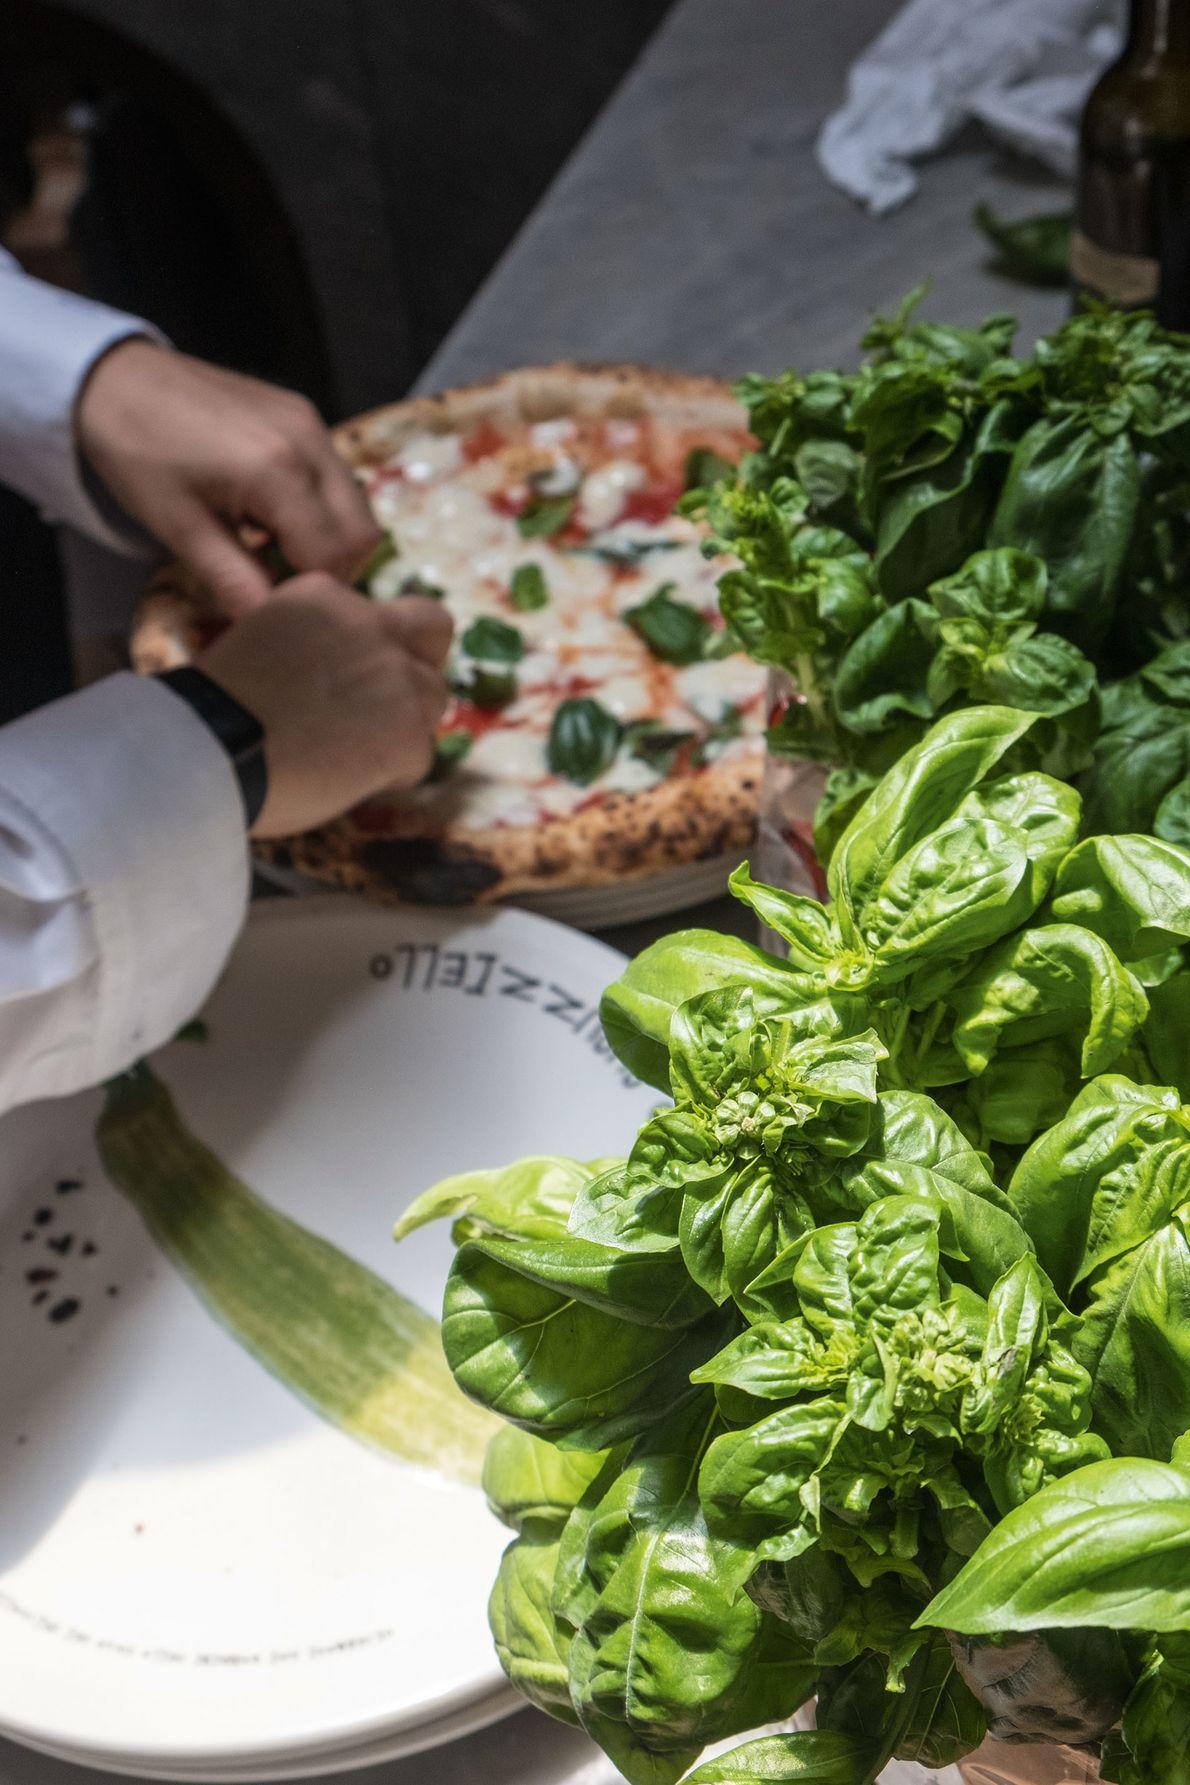 Garnishing a San Marzano pizza with fresh basil, Concettina ai Tre Santi.